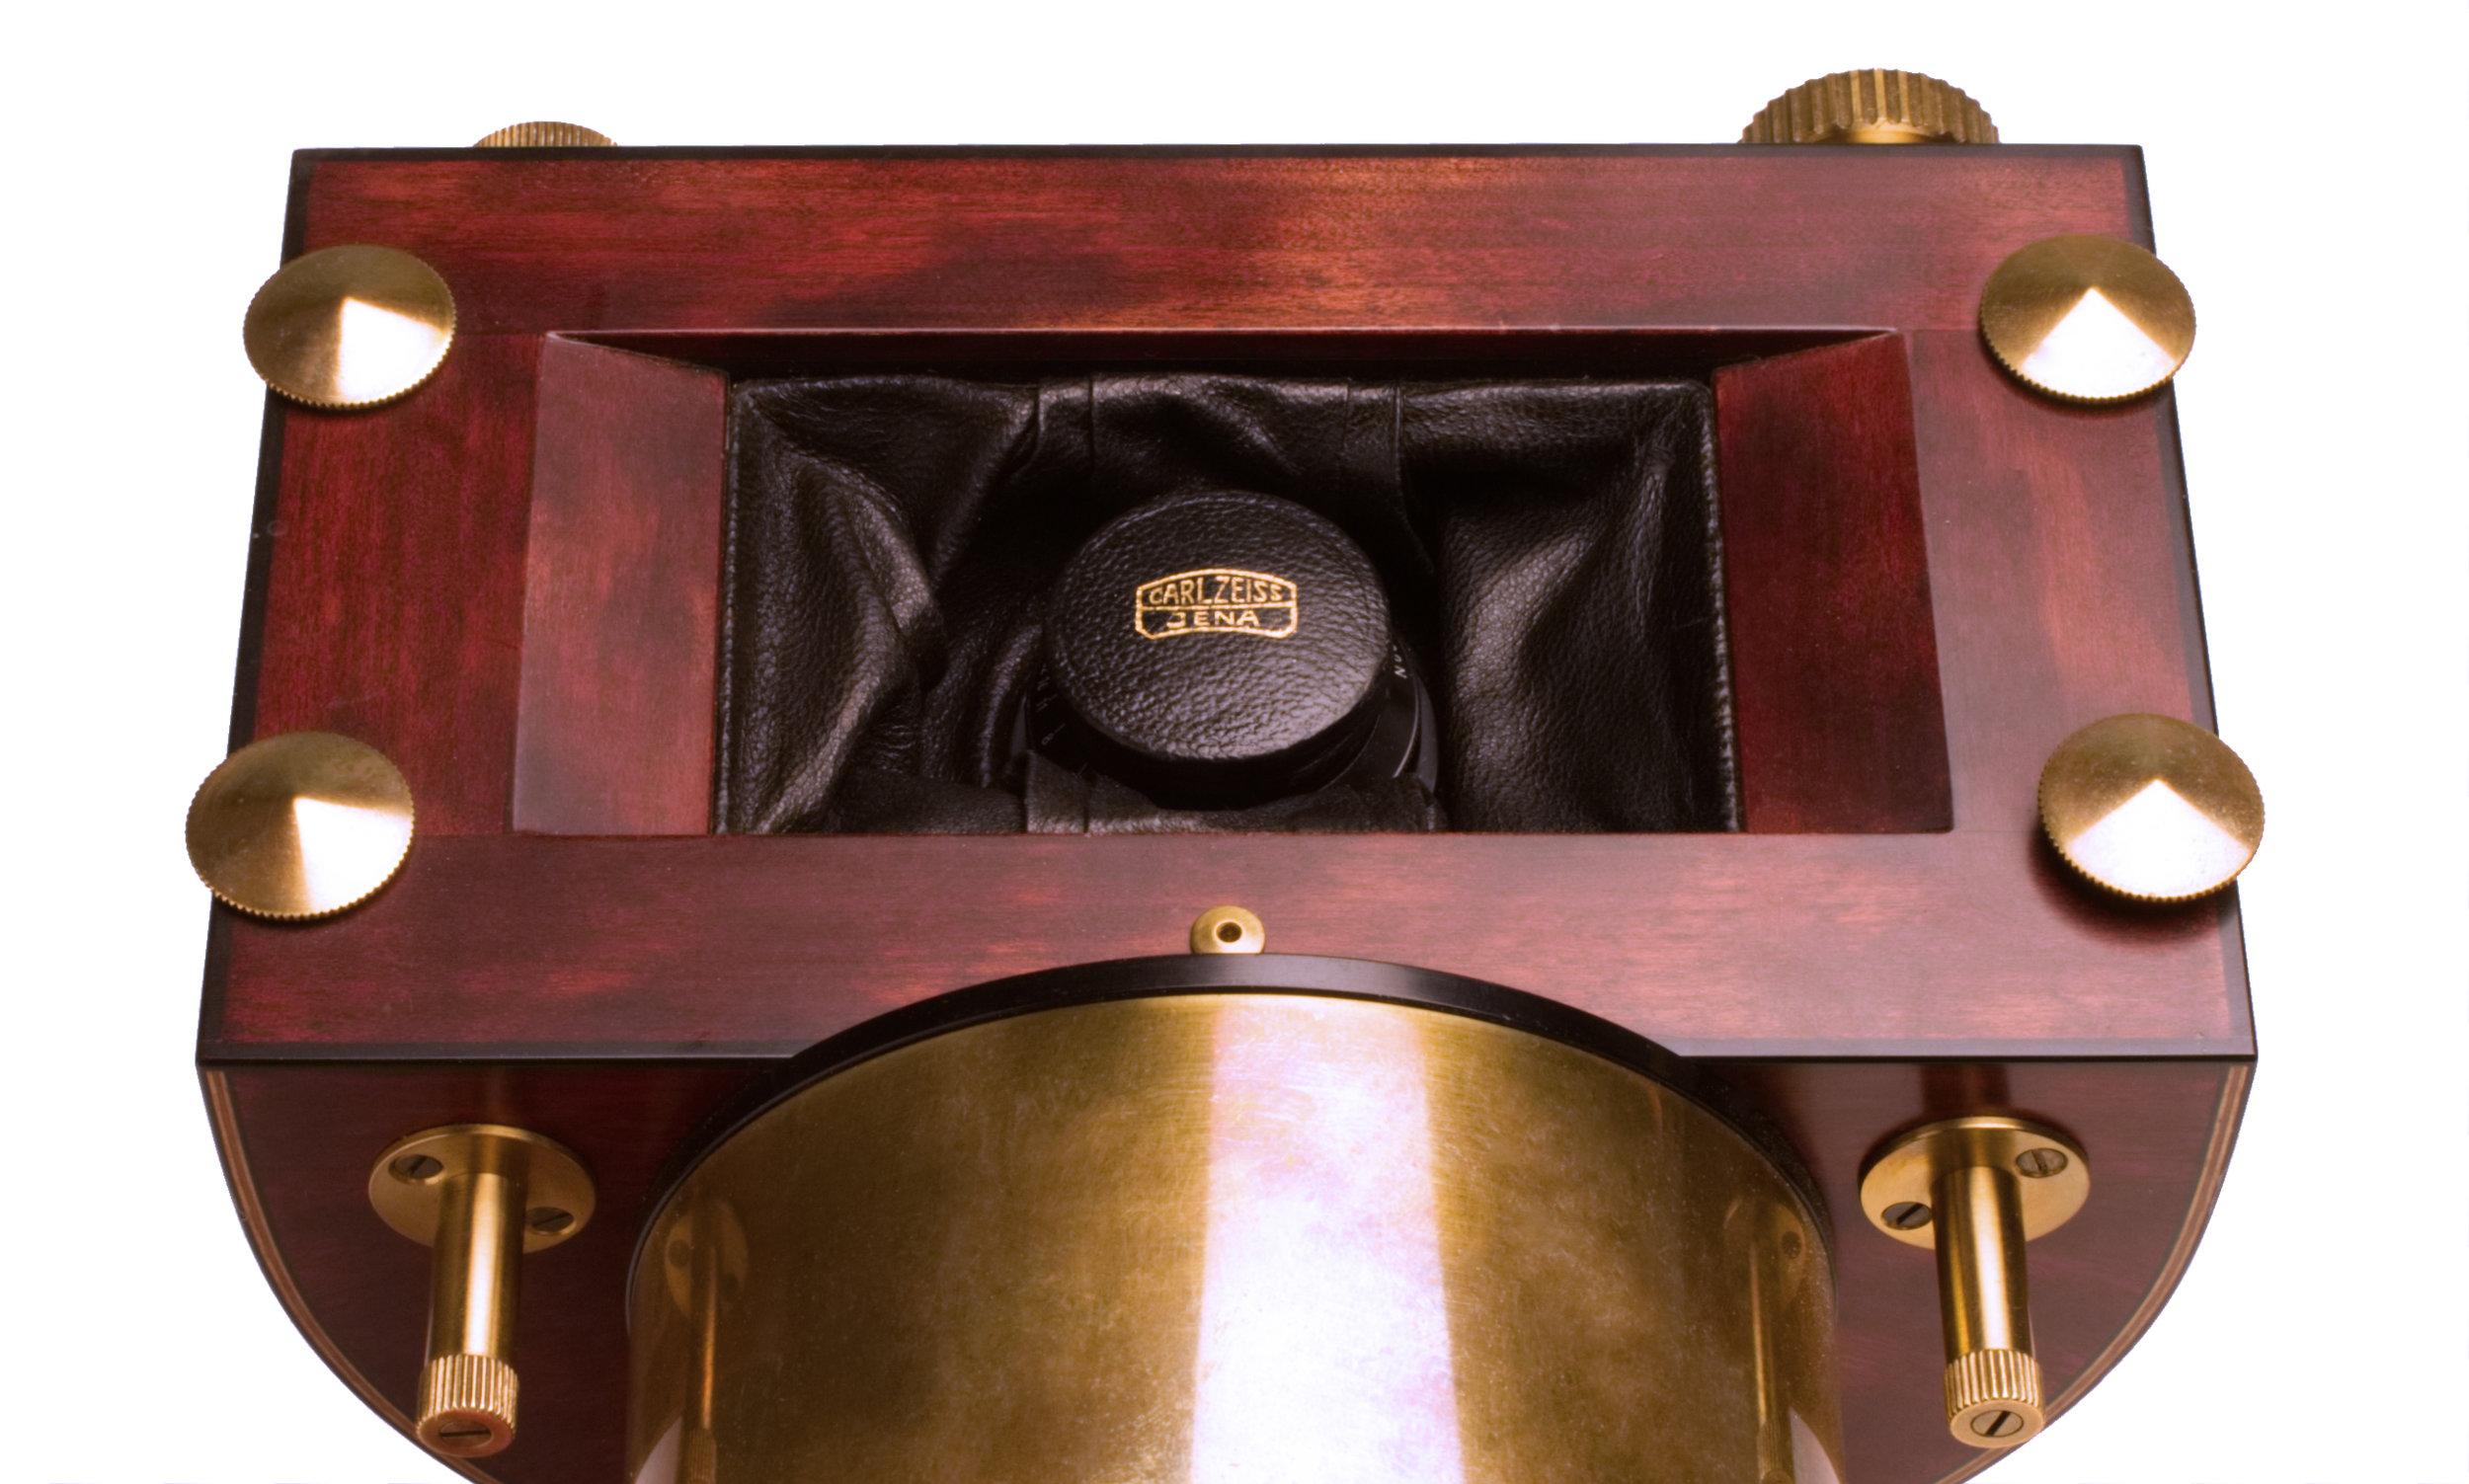 The 'Jules Verne' 6x17 Swing Lens Camera